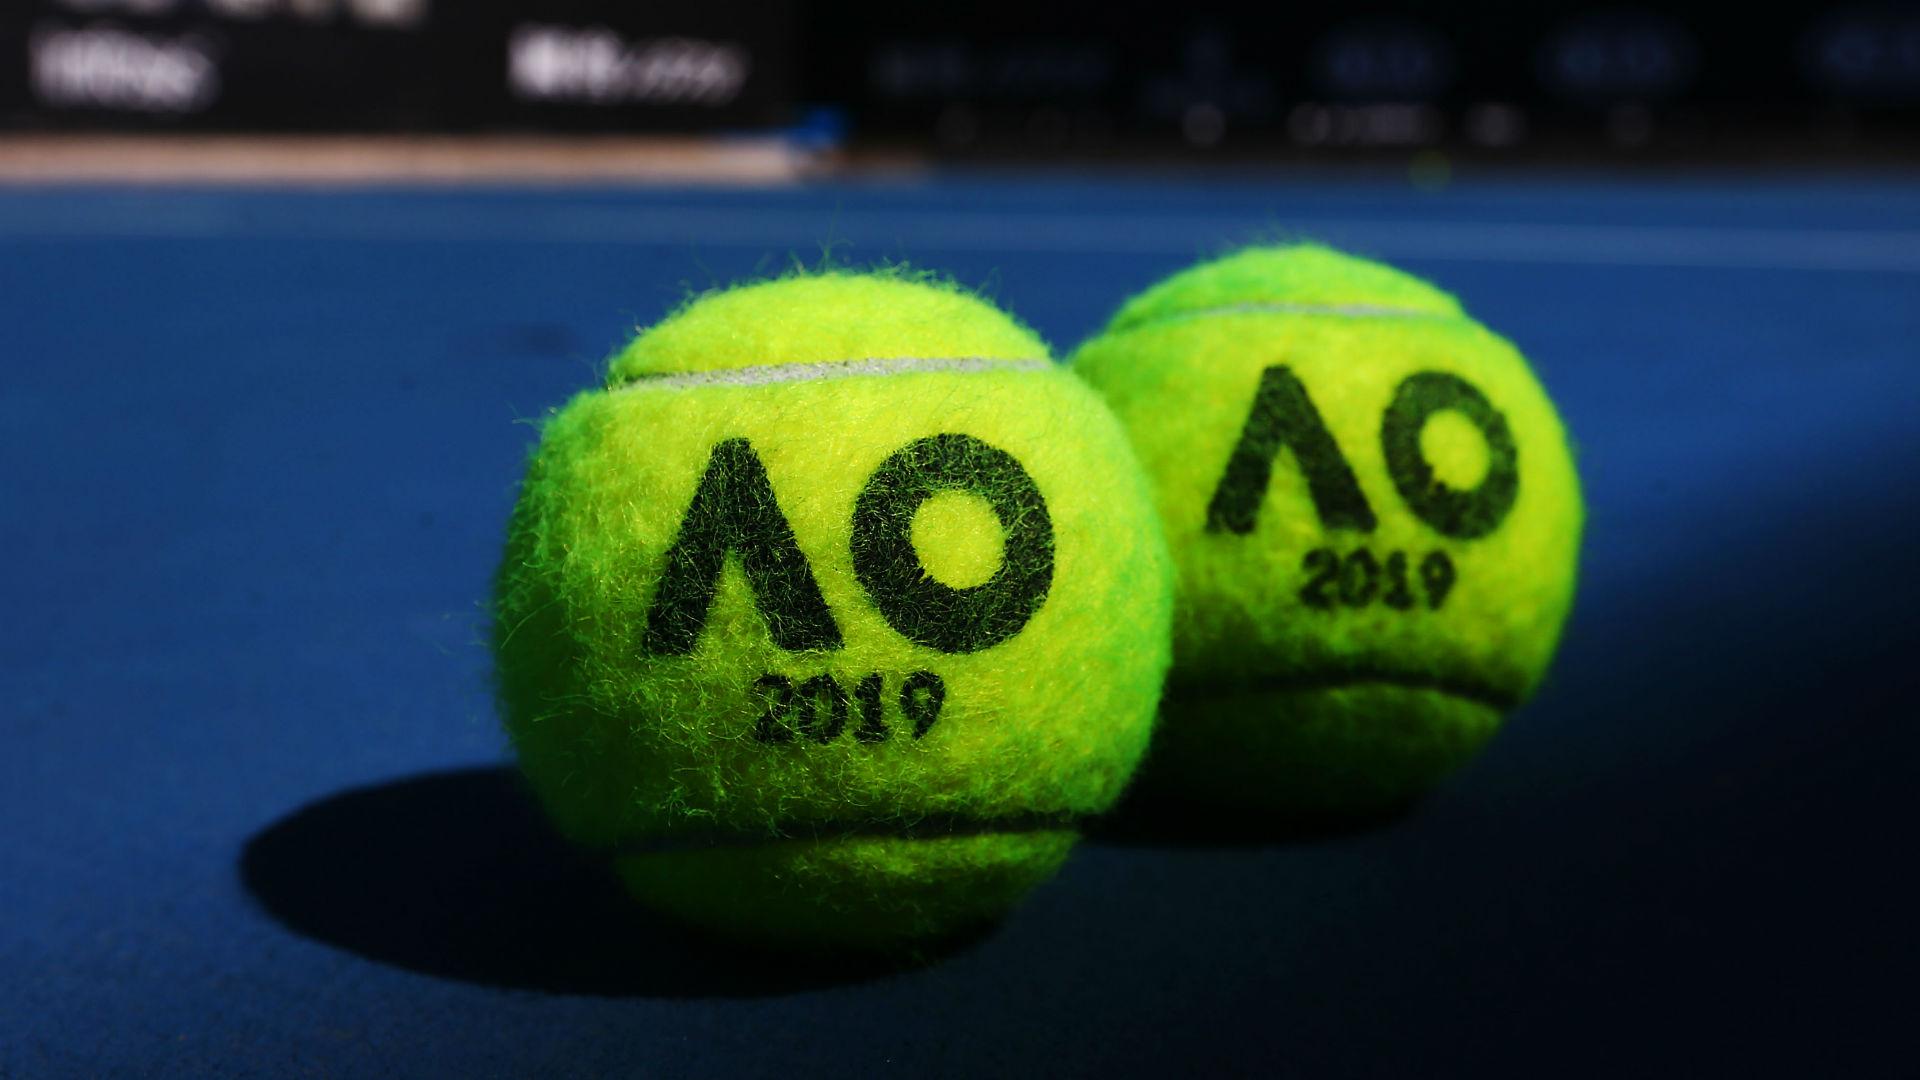 Australian Open 2019 Schedule Draw How To Watch Live Stream